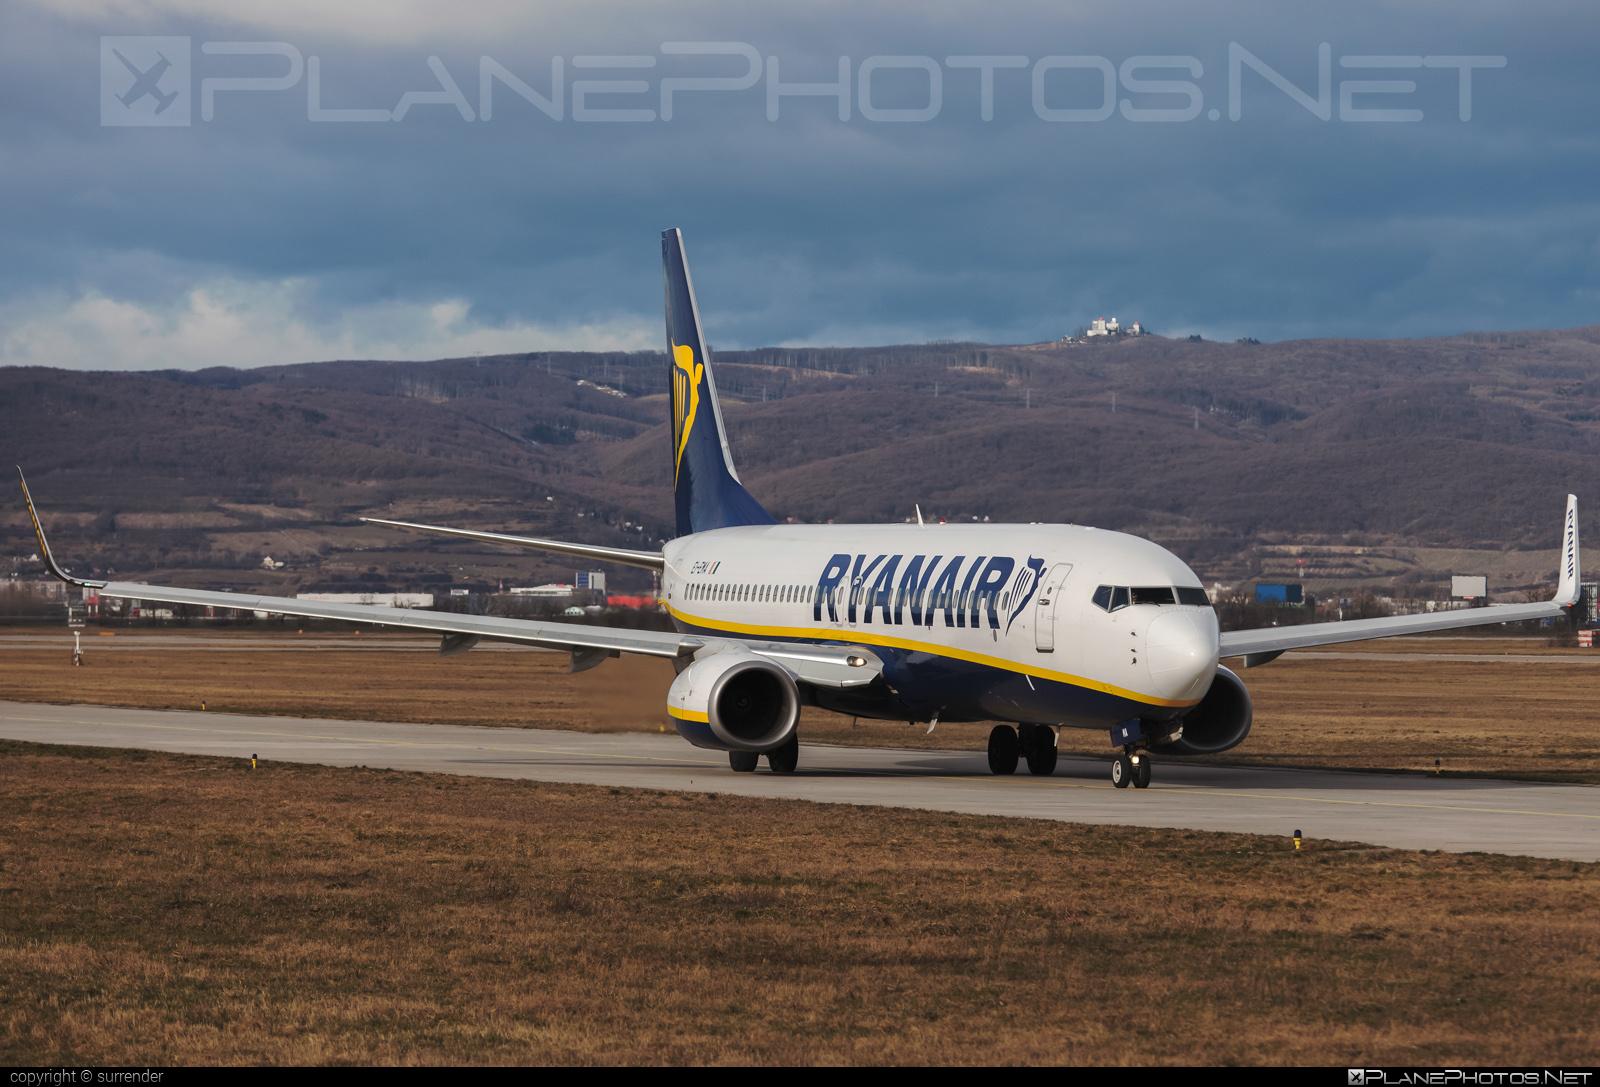 Boeing 737-800 - EI-EMA operated by Ryanair #b737 #b737nextgen #b737ng #boeing #boeing737 #ryanair